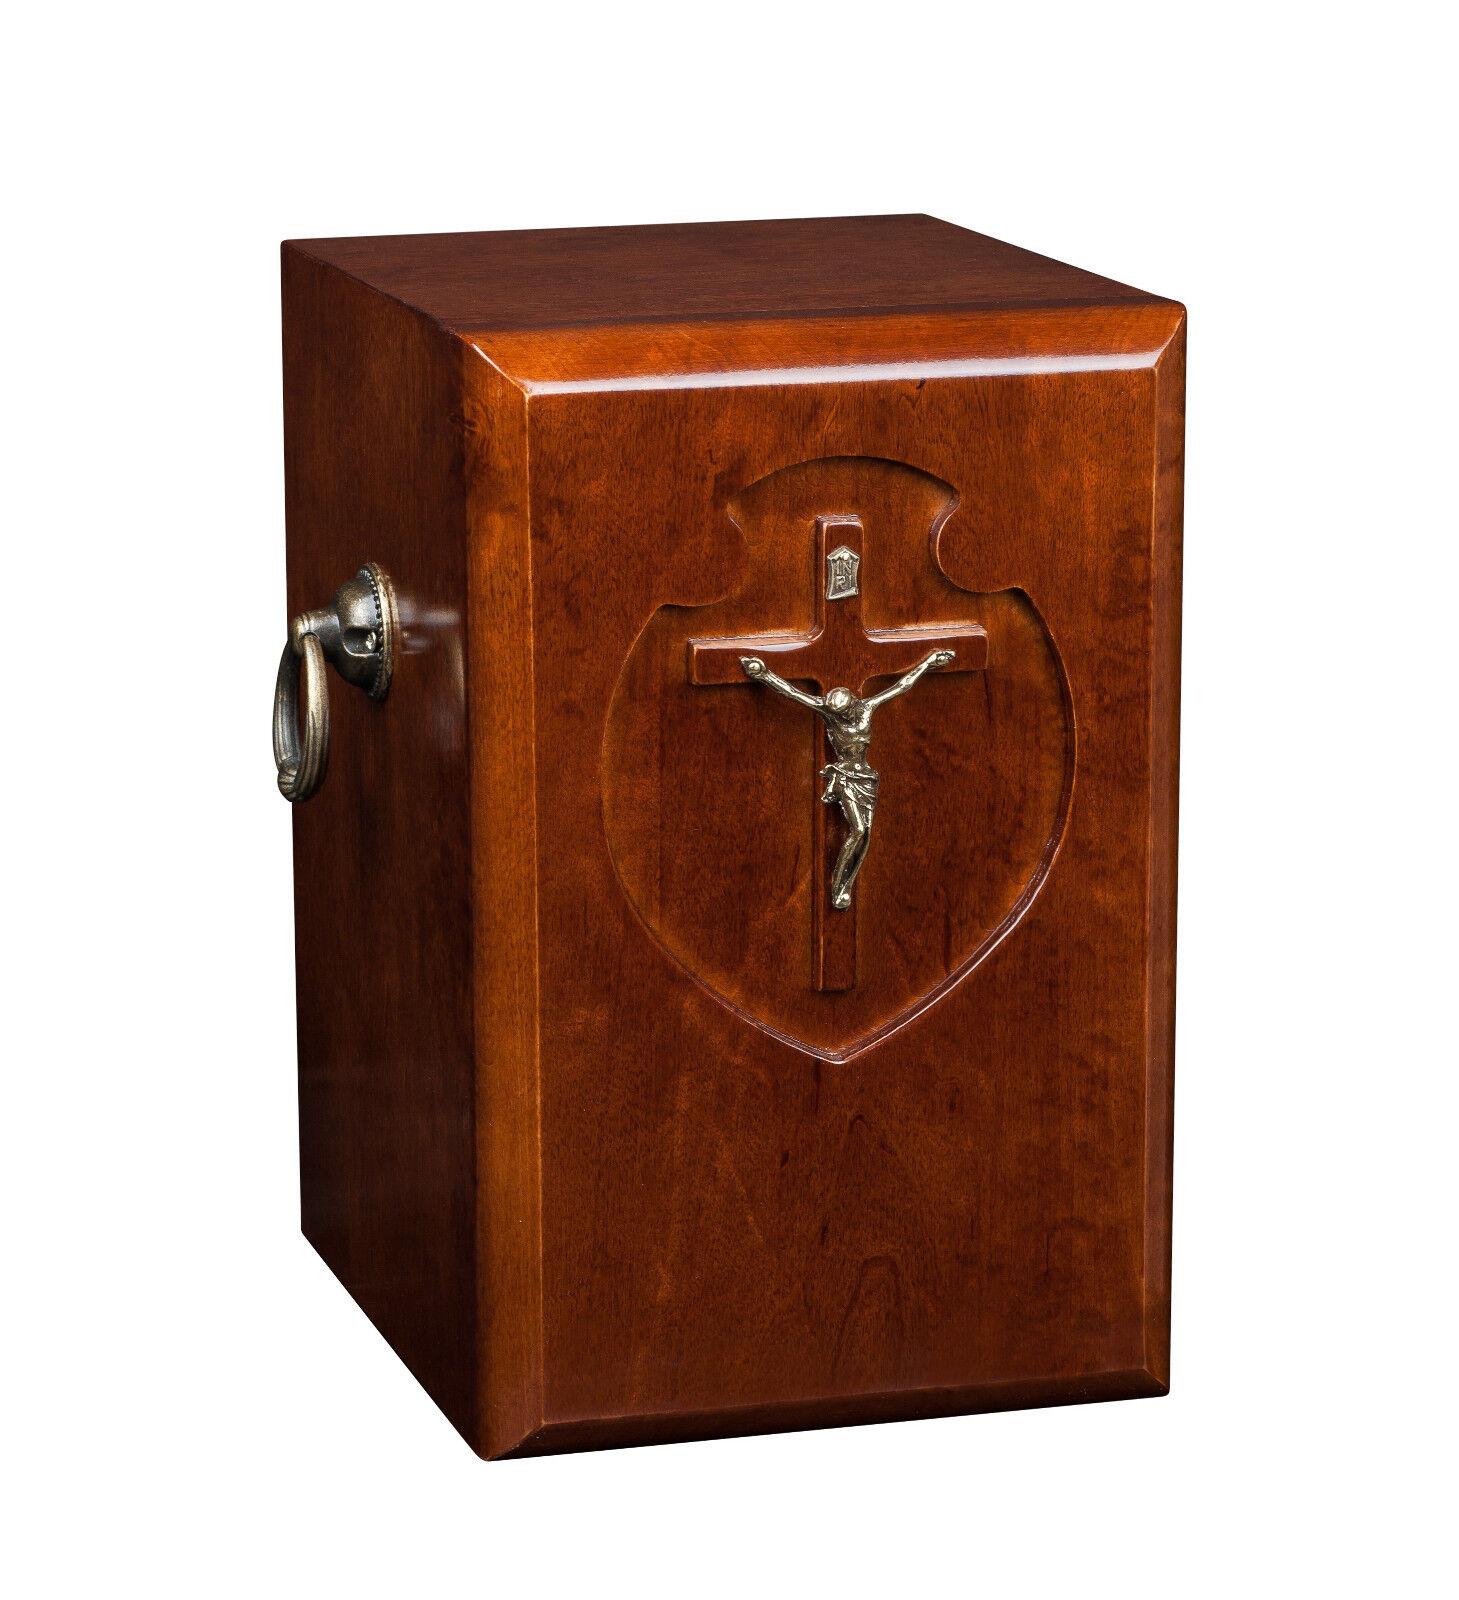 Hermoso de madera sólida, Cremación Urna Cenizas Adulto. Ataúd Para Adulto. Cenizas urna de la cremación (WU41) 23e0cf